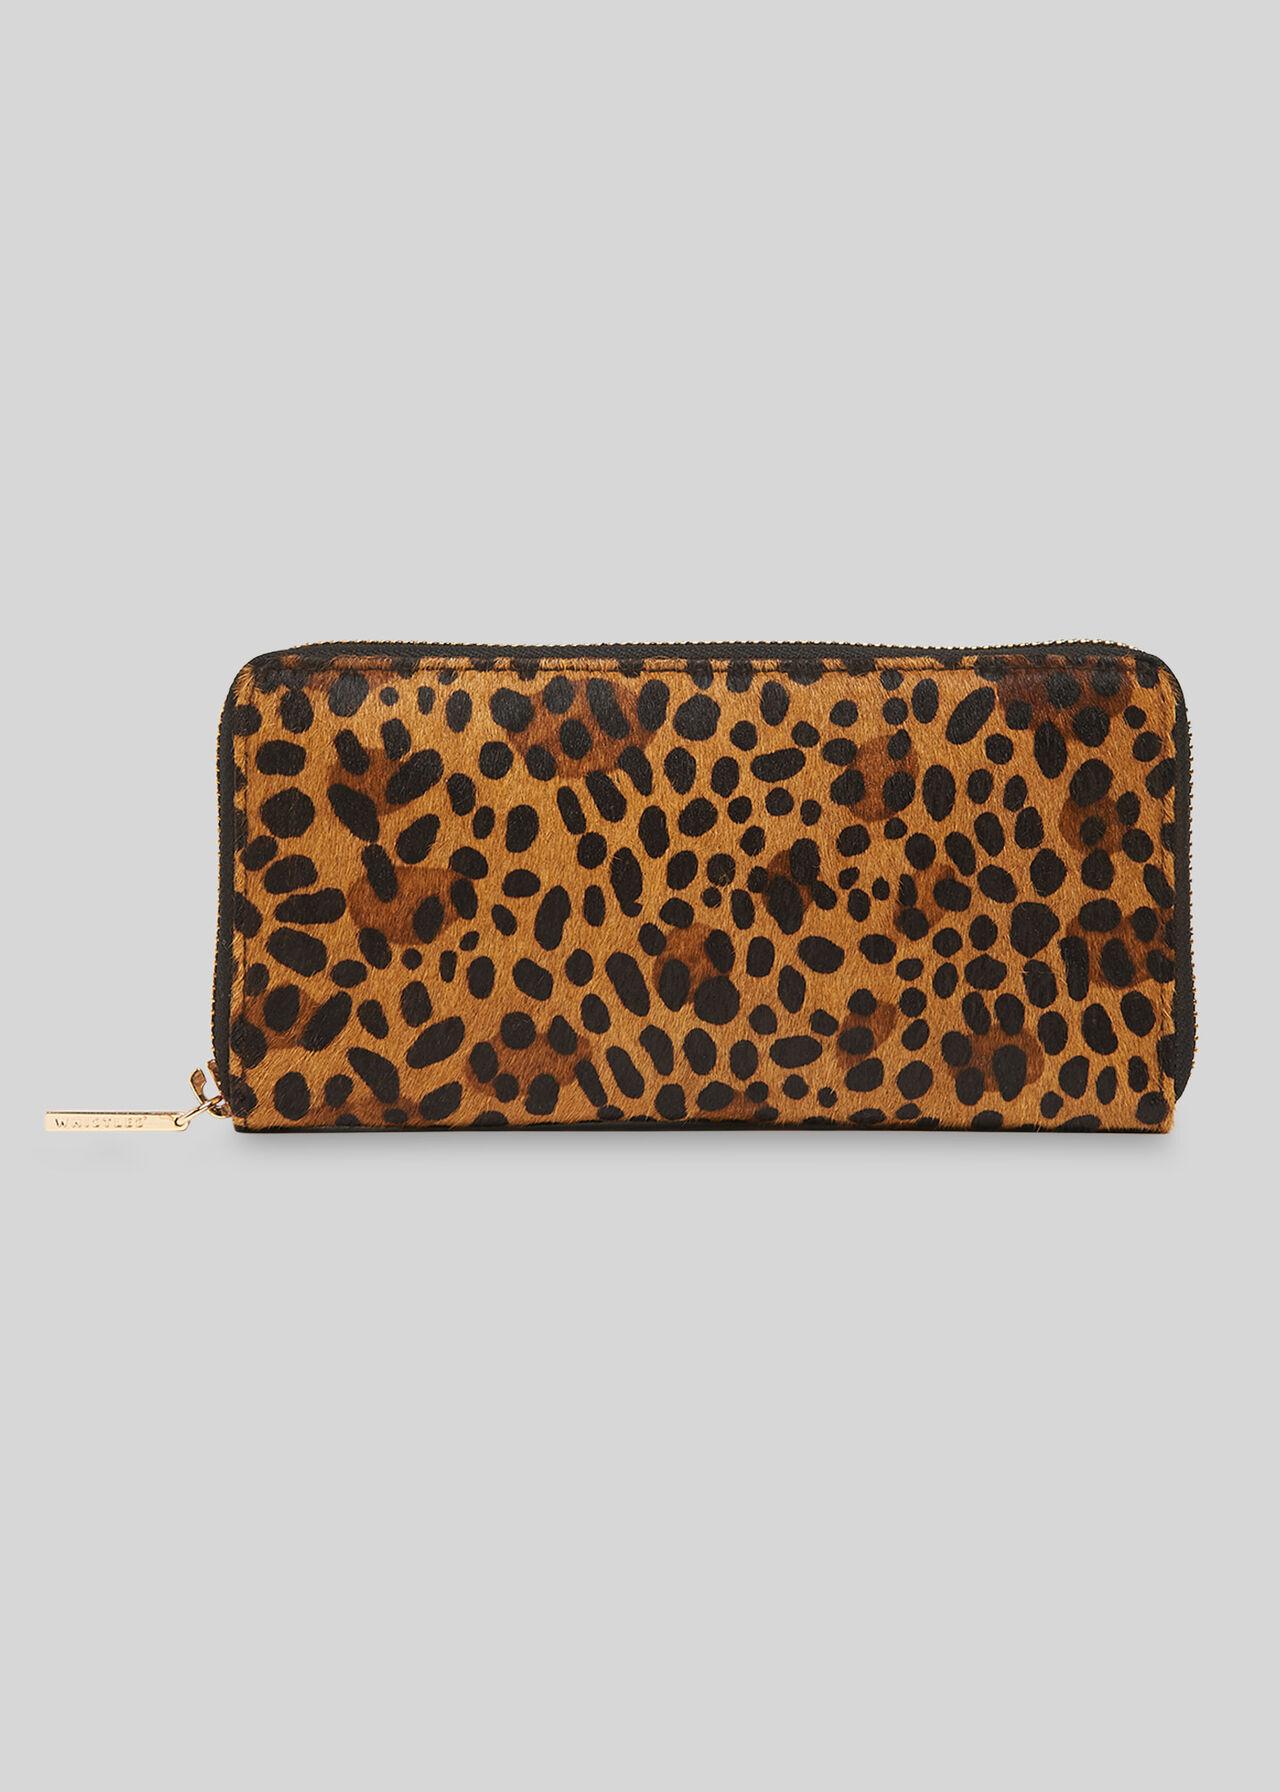 Reigate Leopard Wallet Leopard Print